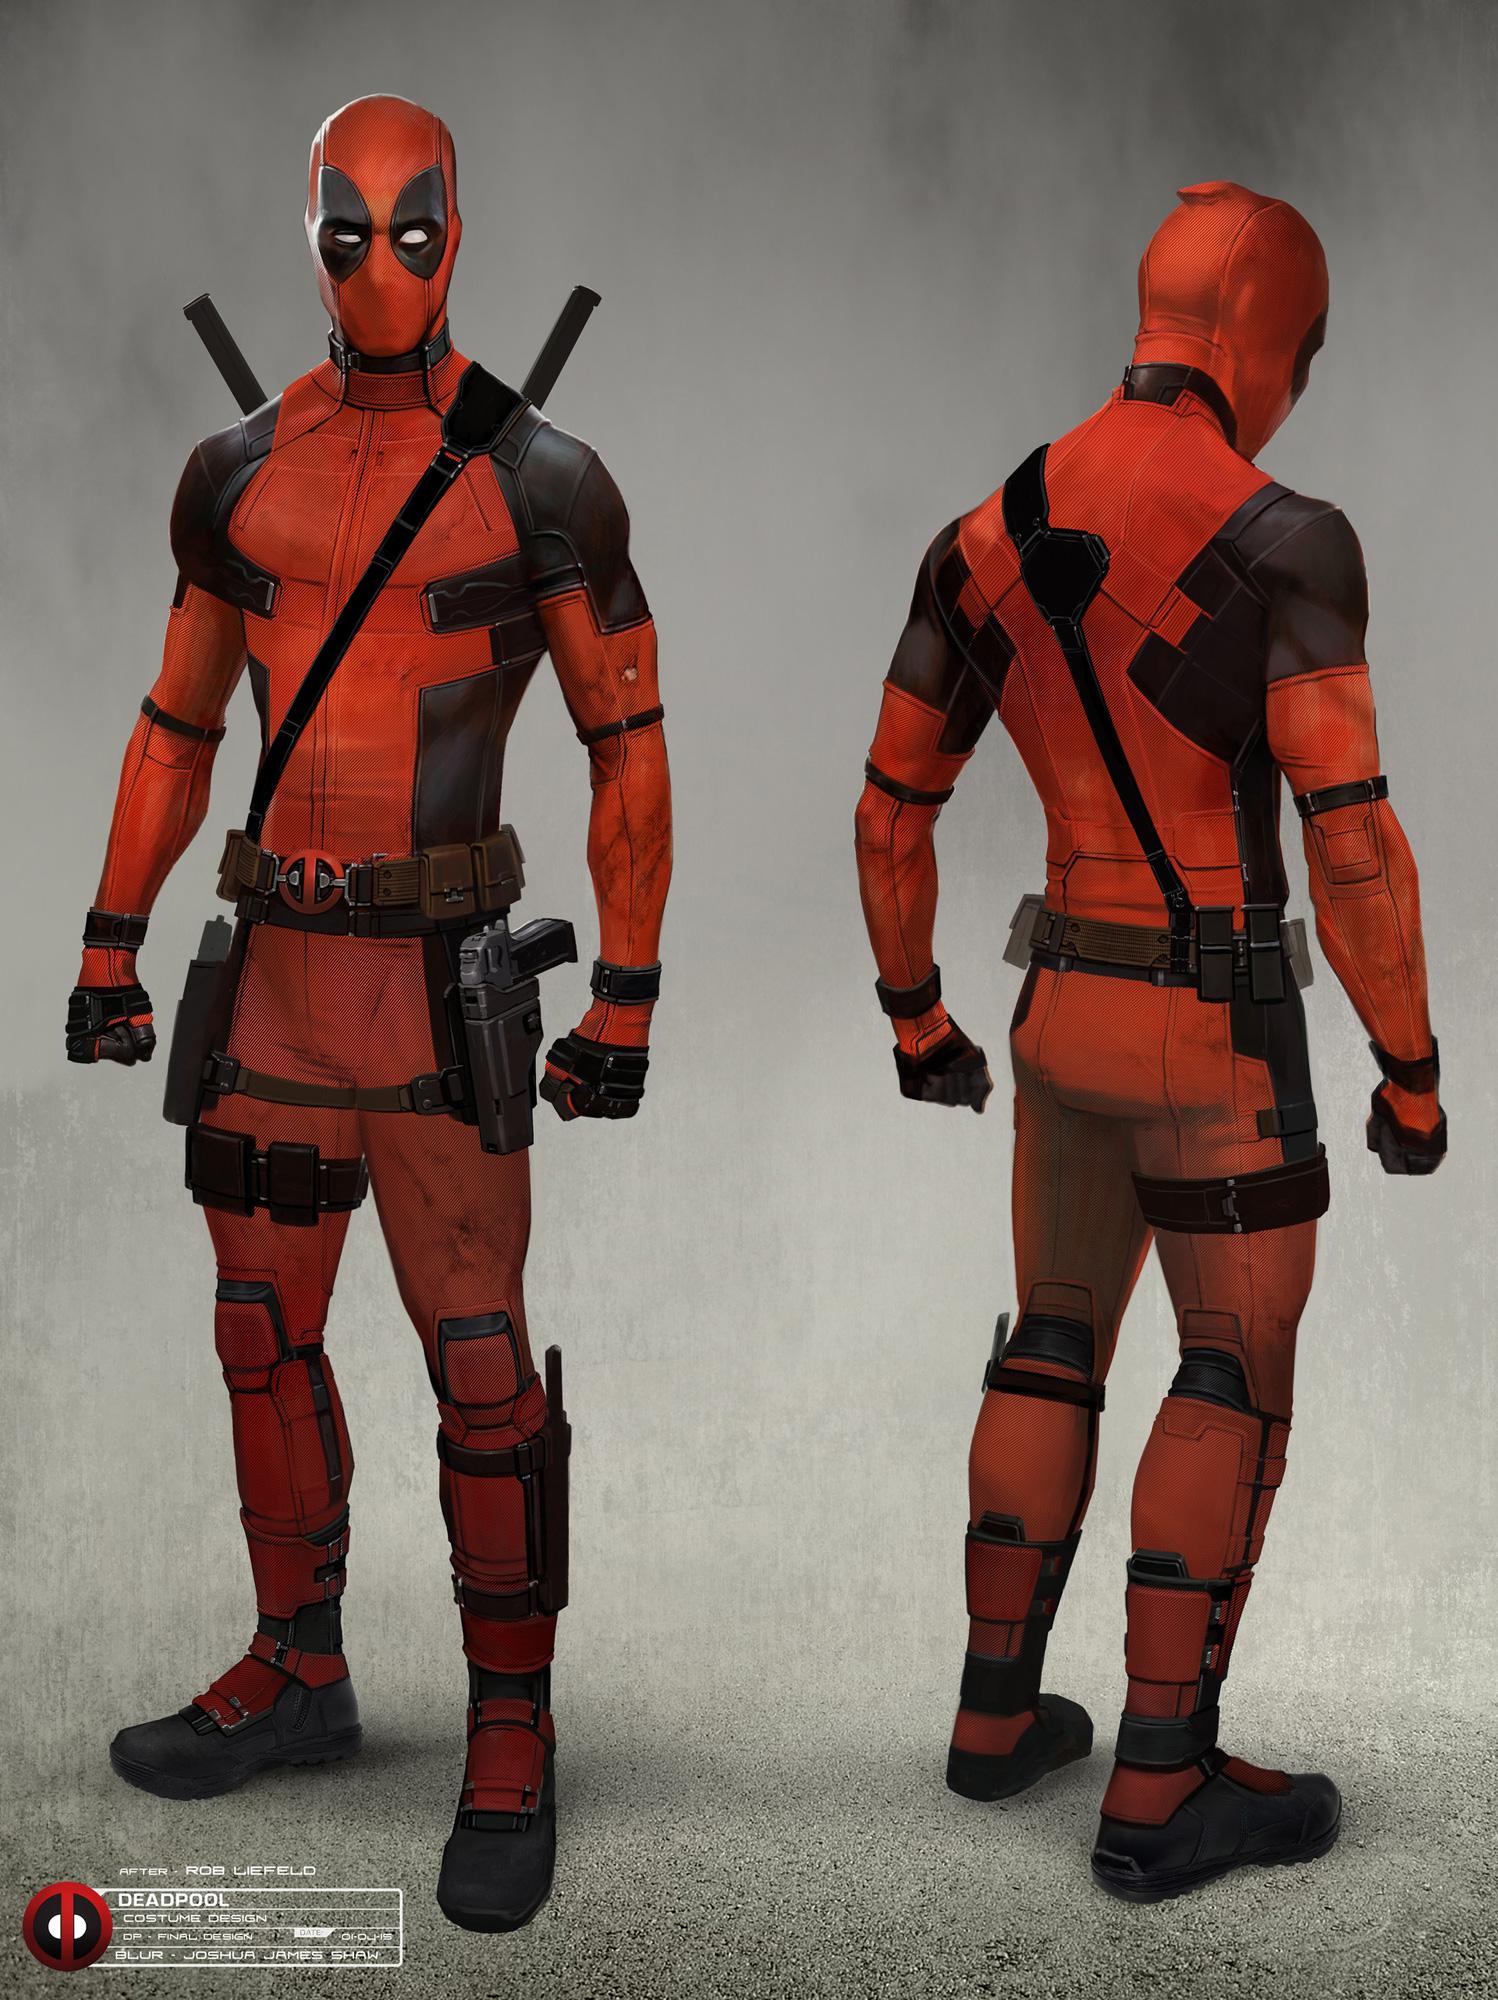 Deadpool Concept Art by Joshua James Shaw | Concept Art World